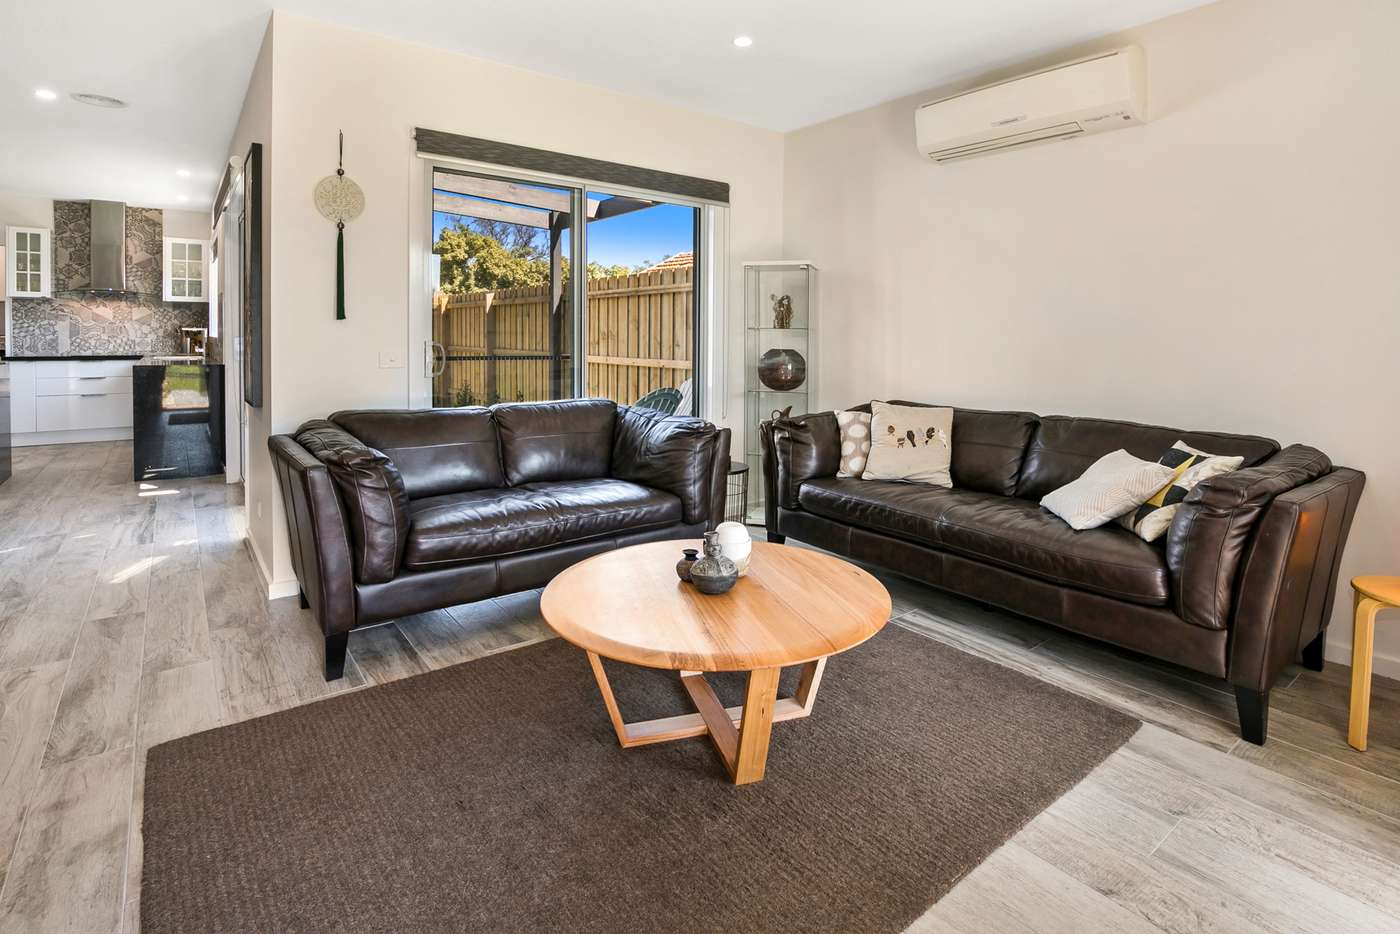 Sixth view of Homely house listing, 12 Ti Tree Grove, Mornington VIC 3931